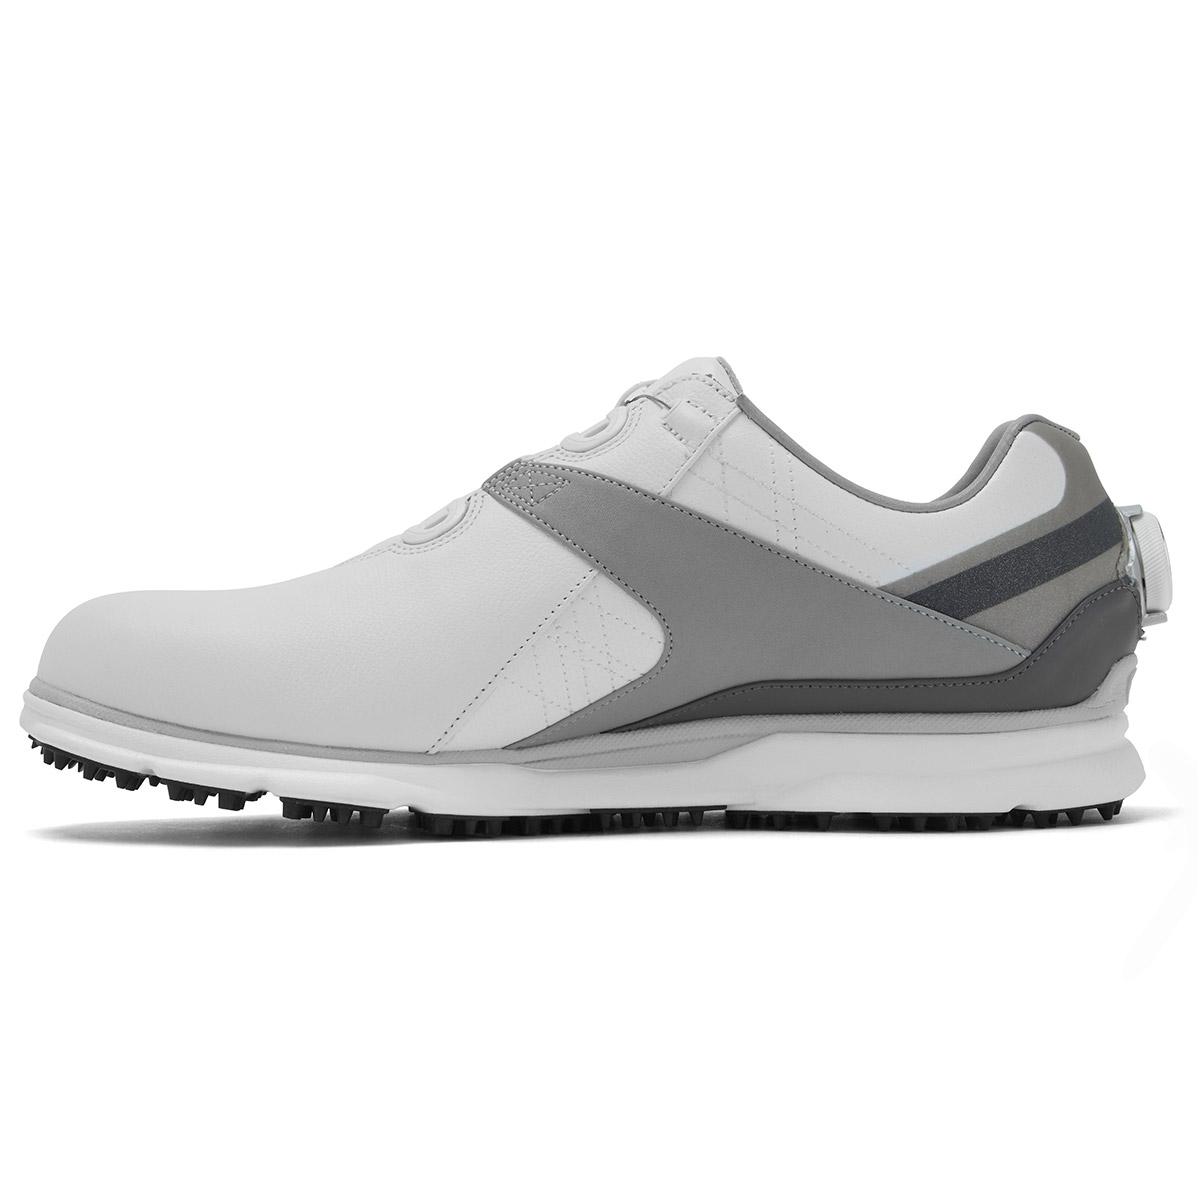 355230-WhiteGrey-FootJoy-Pro-SL-BOA-Shoes-2020-2